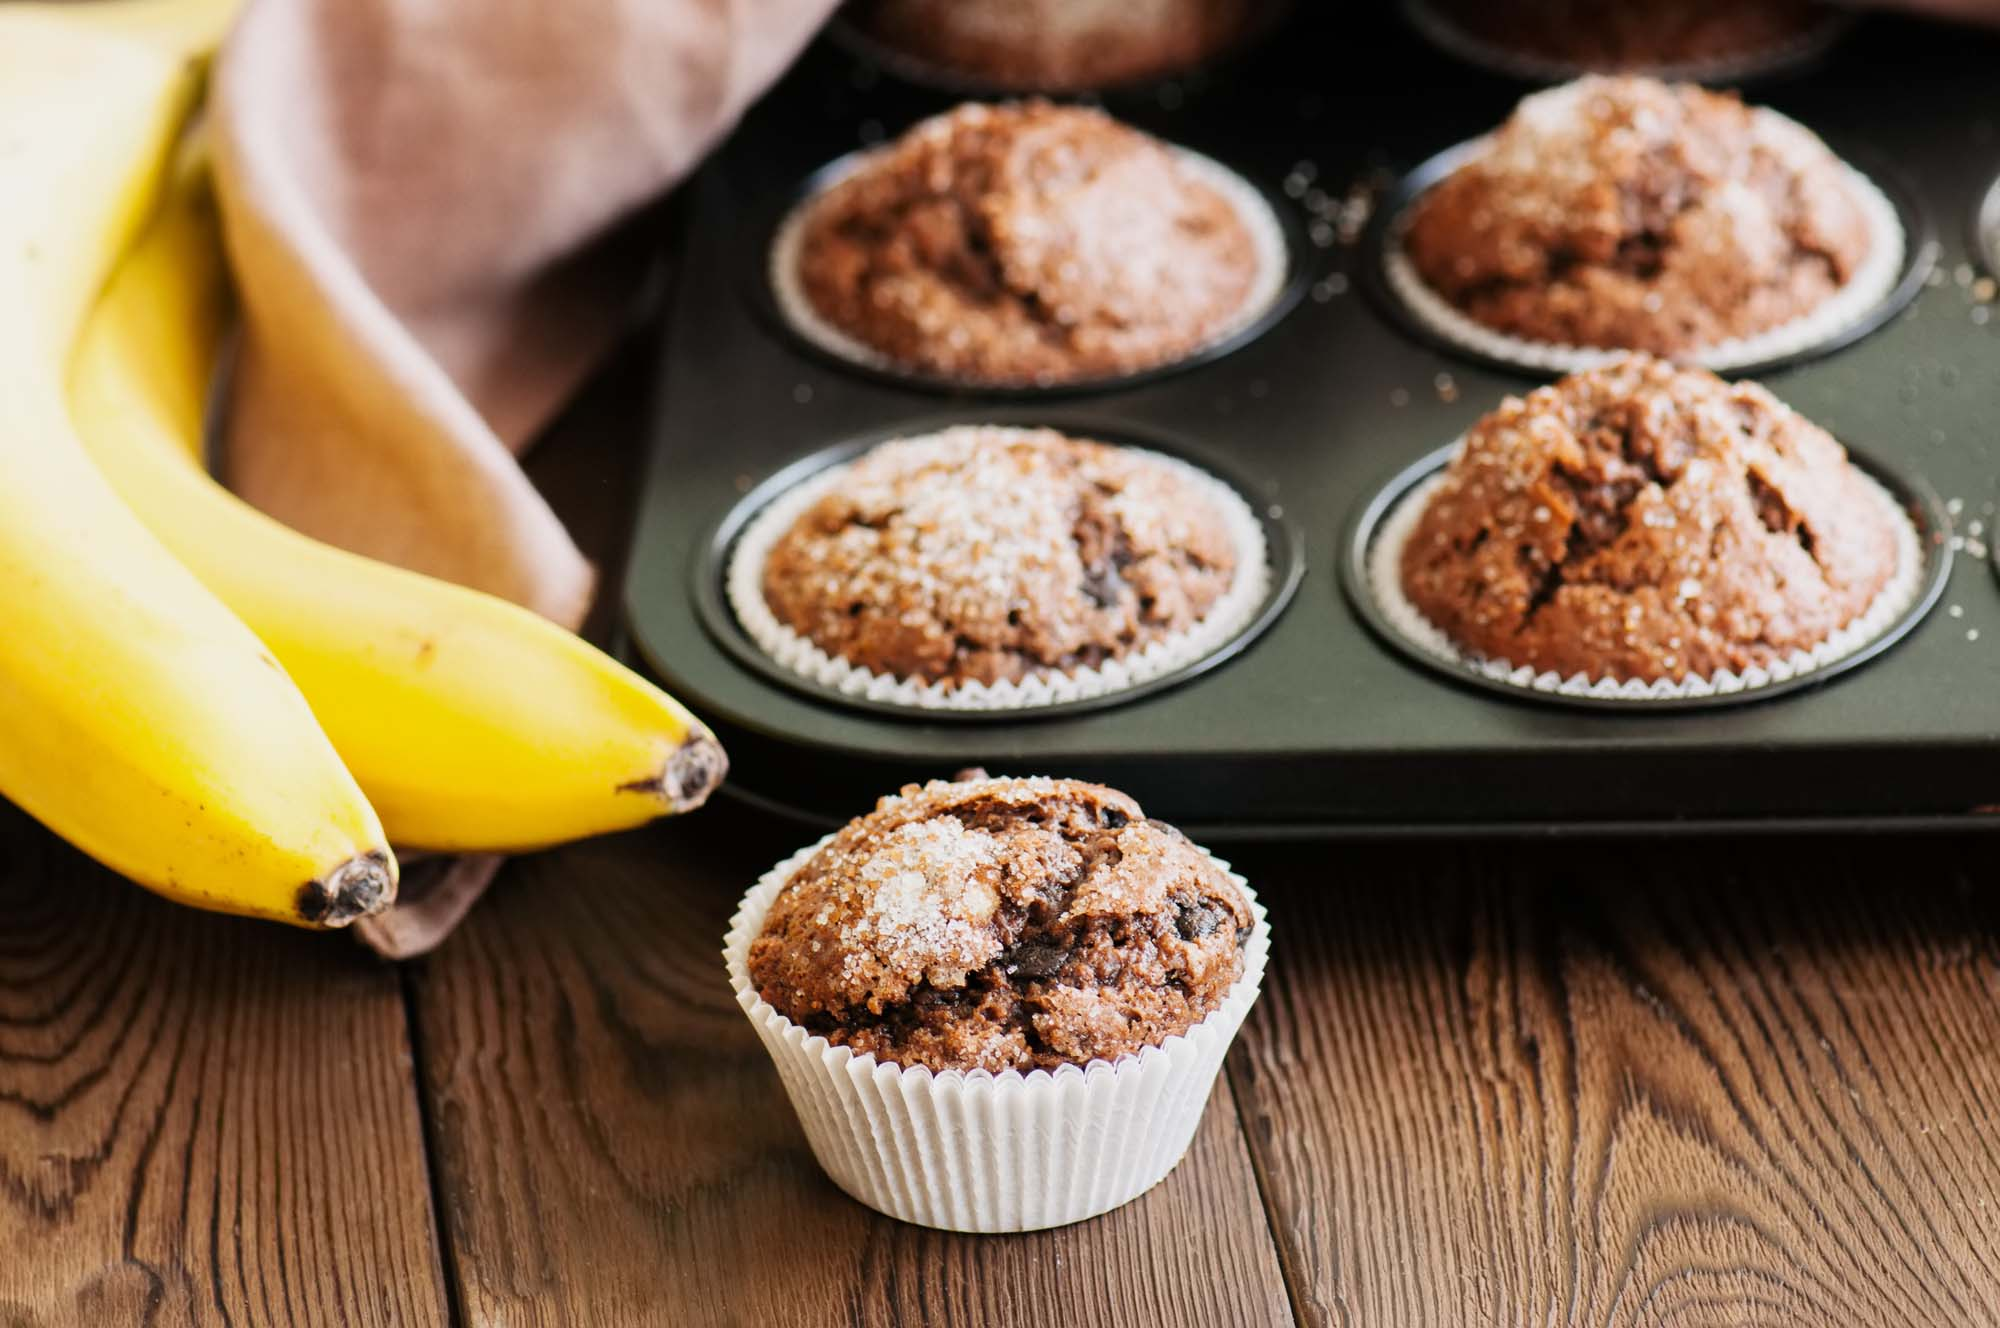 Banan choko muffins